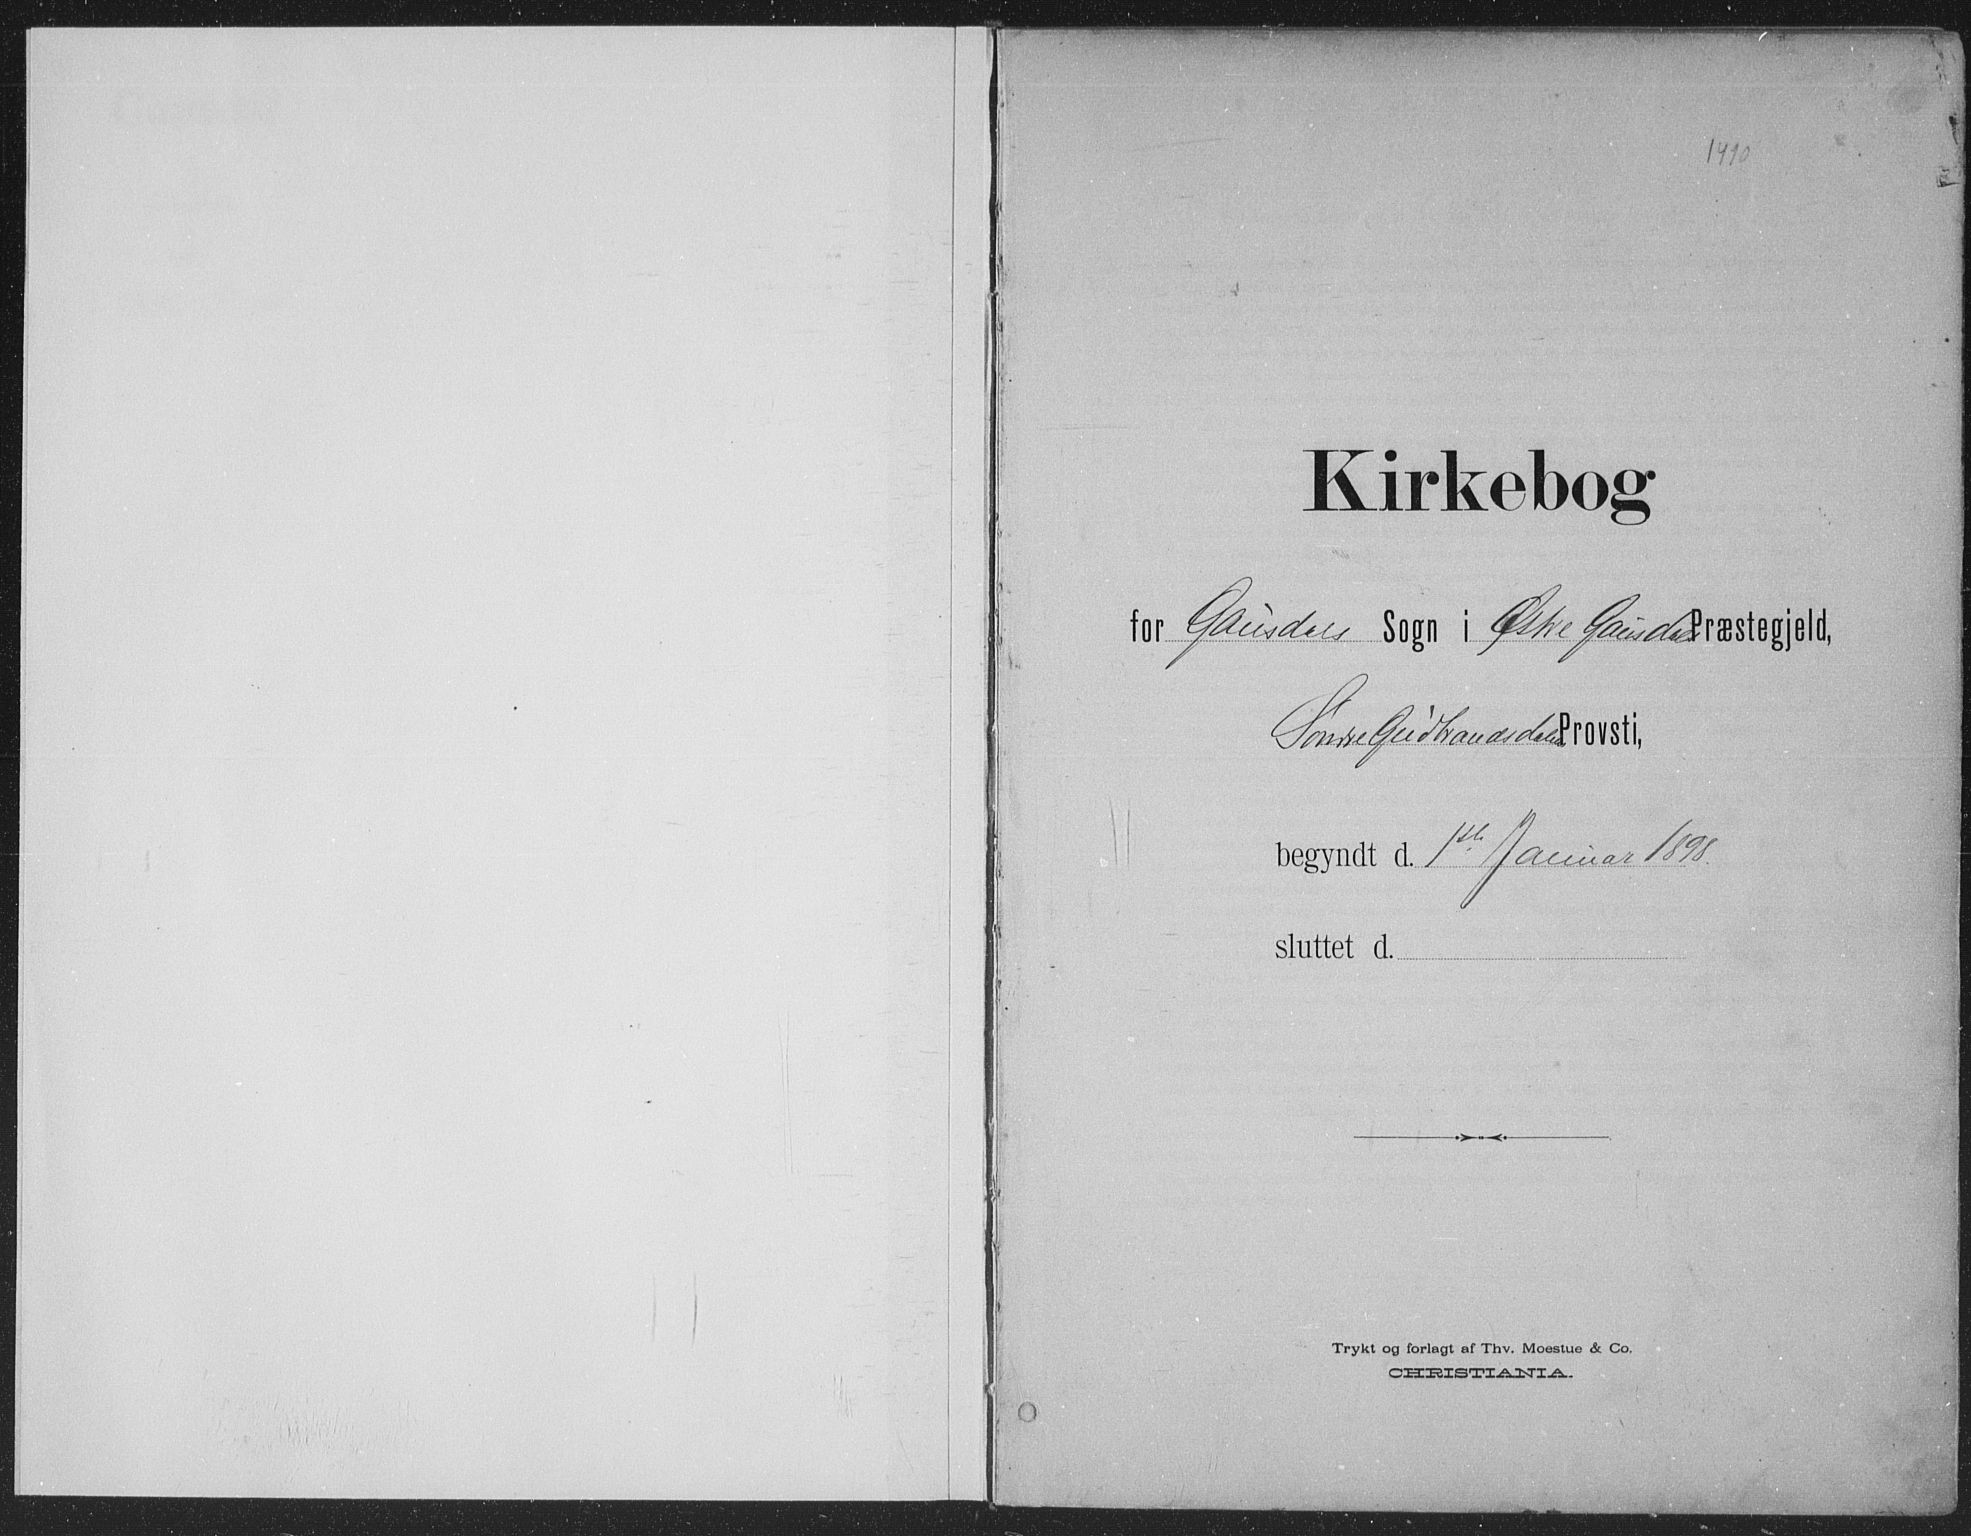 SAH, Østre Gausdal prestekontor, Ministerialbok nr. 4, 1898-1914